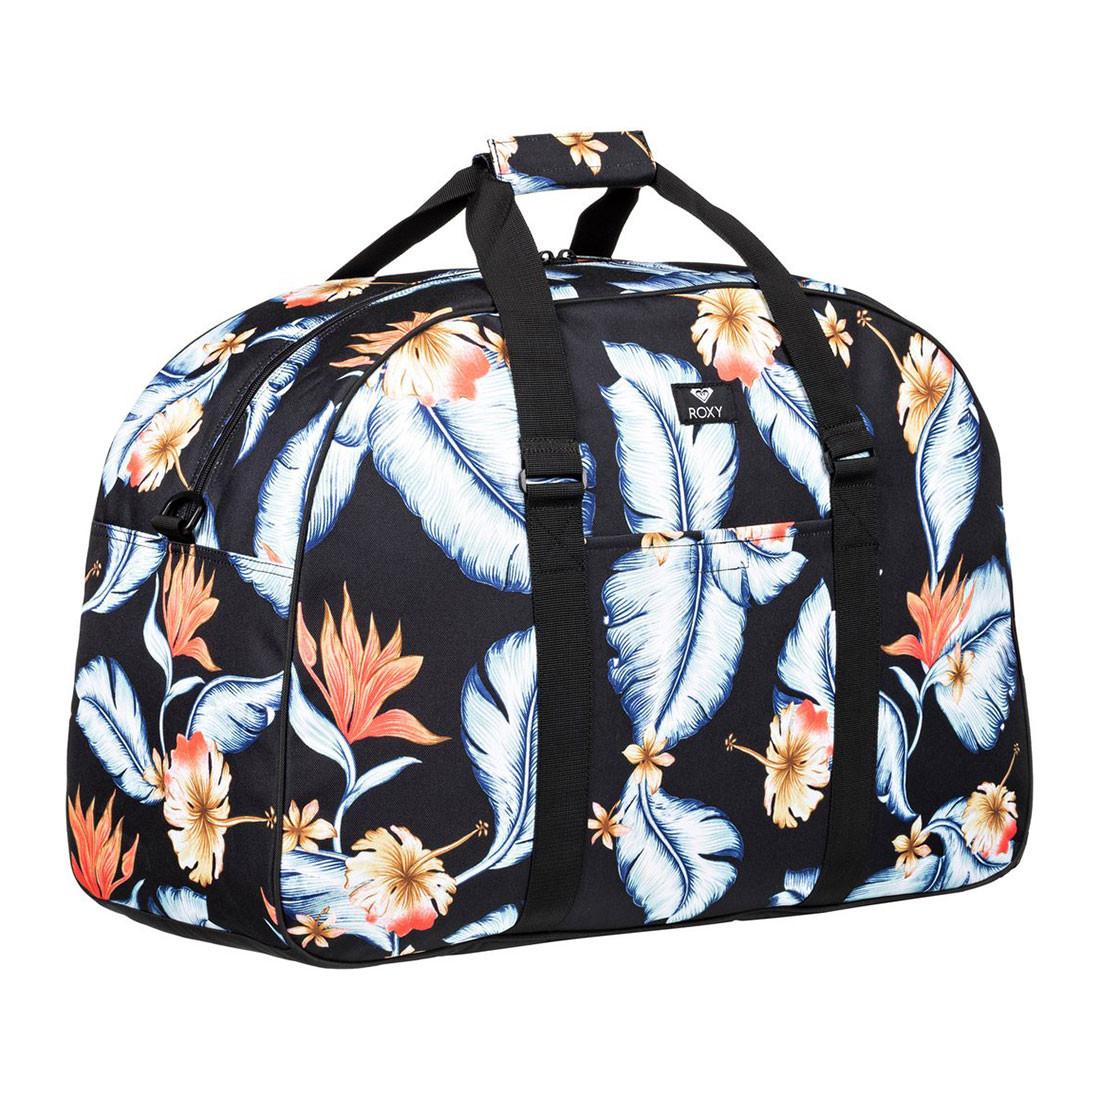 c7c3d3e83a Cestovní taška Roxy Feel Happy Big anthracite tropical love s ...